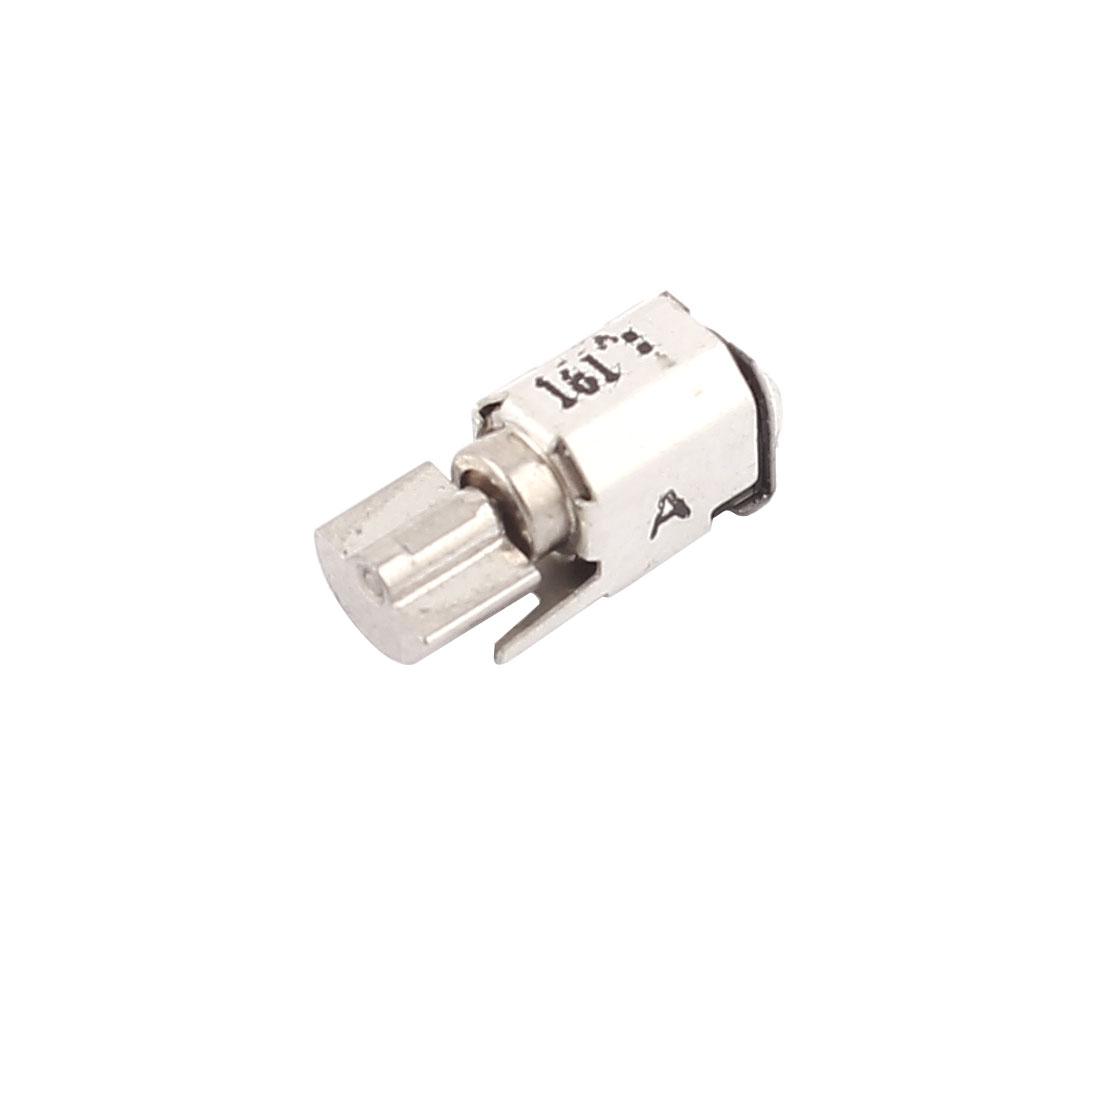 DC 1.5V/0.04A 3V/0.09A 1000RPM Mini Micro Vibration Motor Replacement